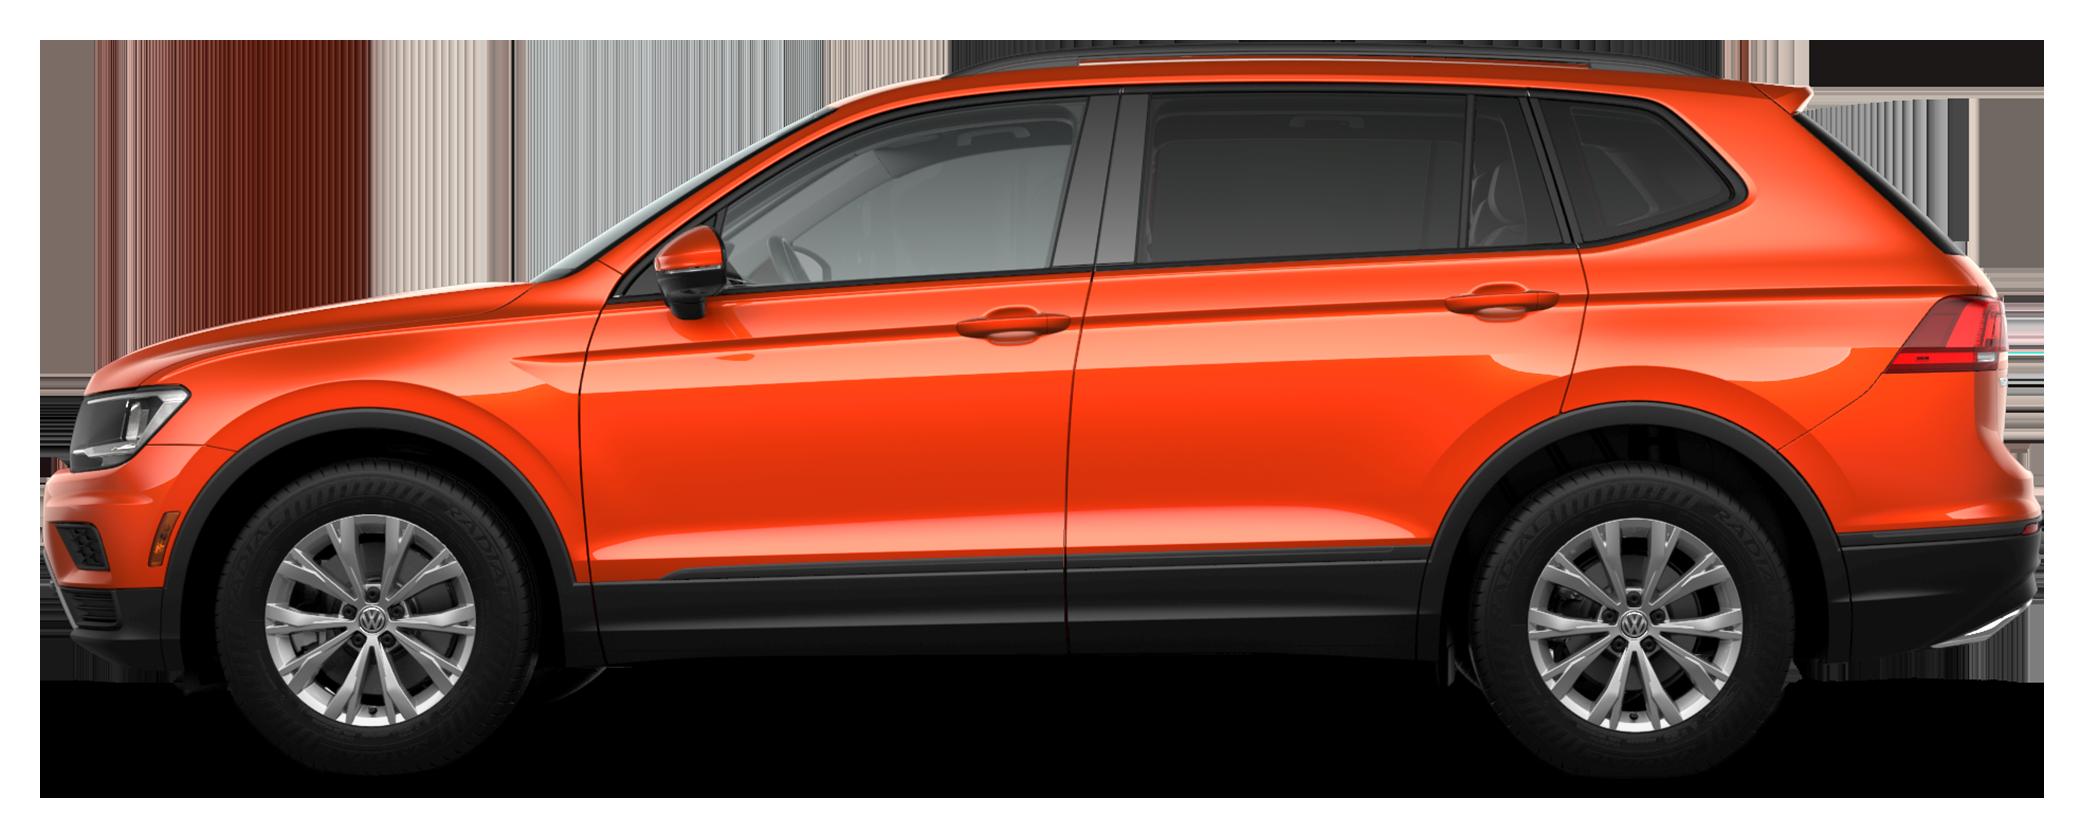 2019 Volkswagen Tiguan SUV 2.0T S 4MOTION